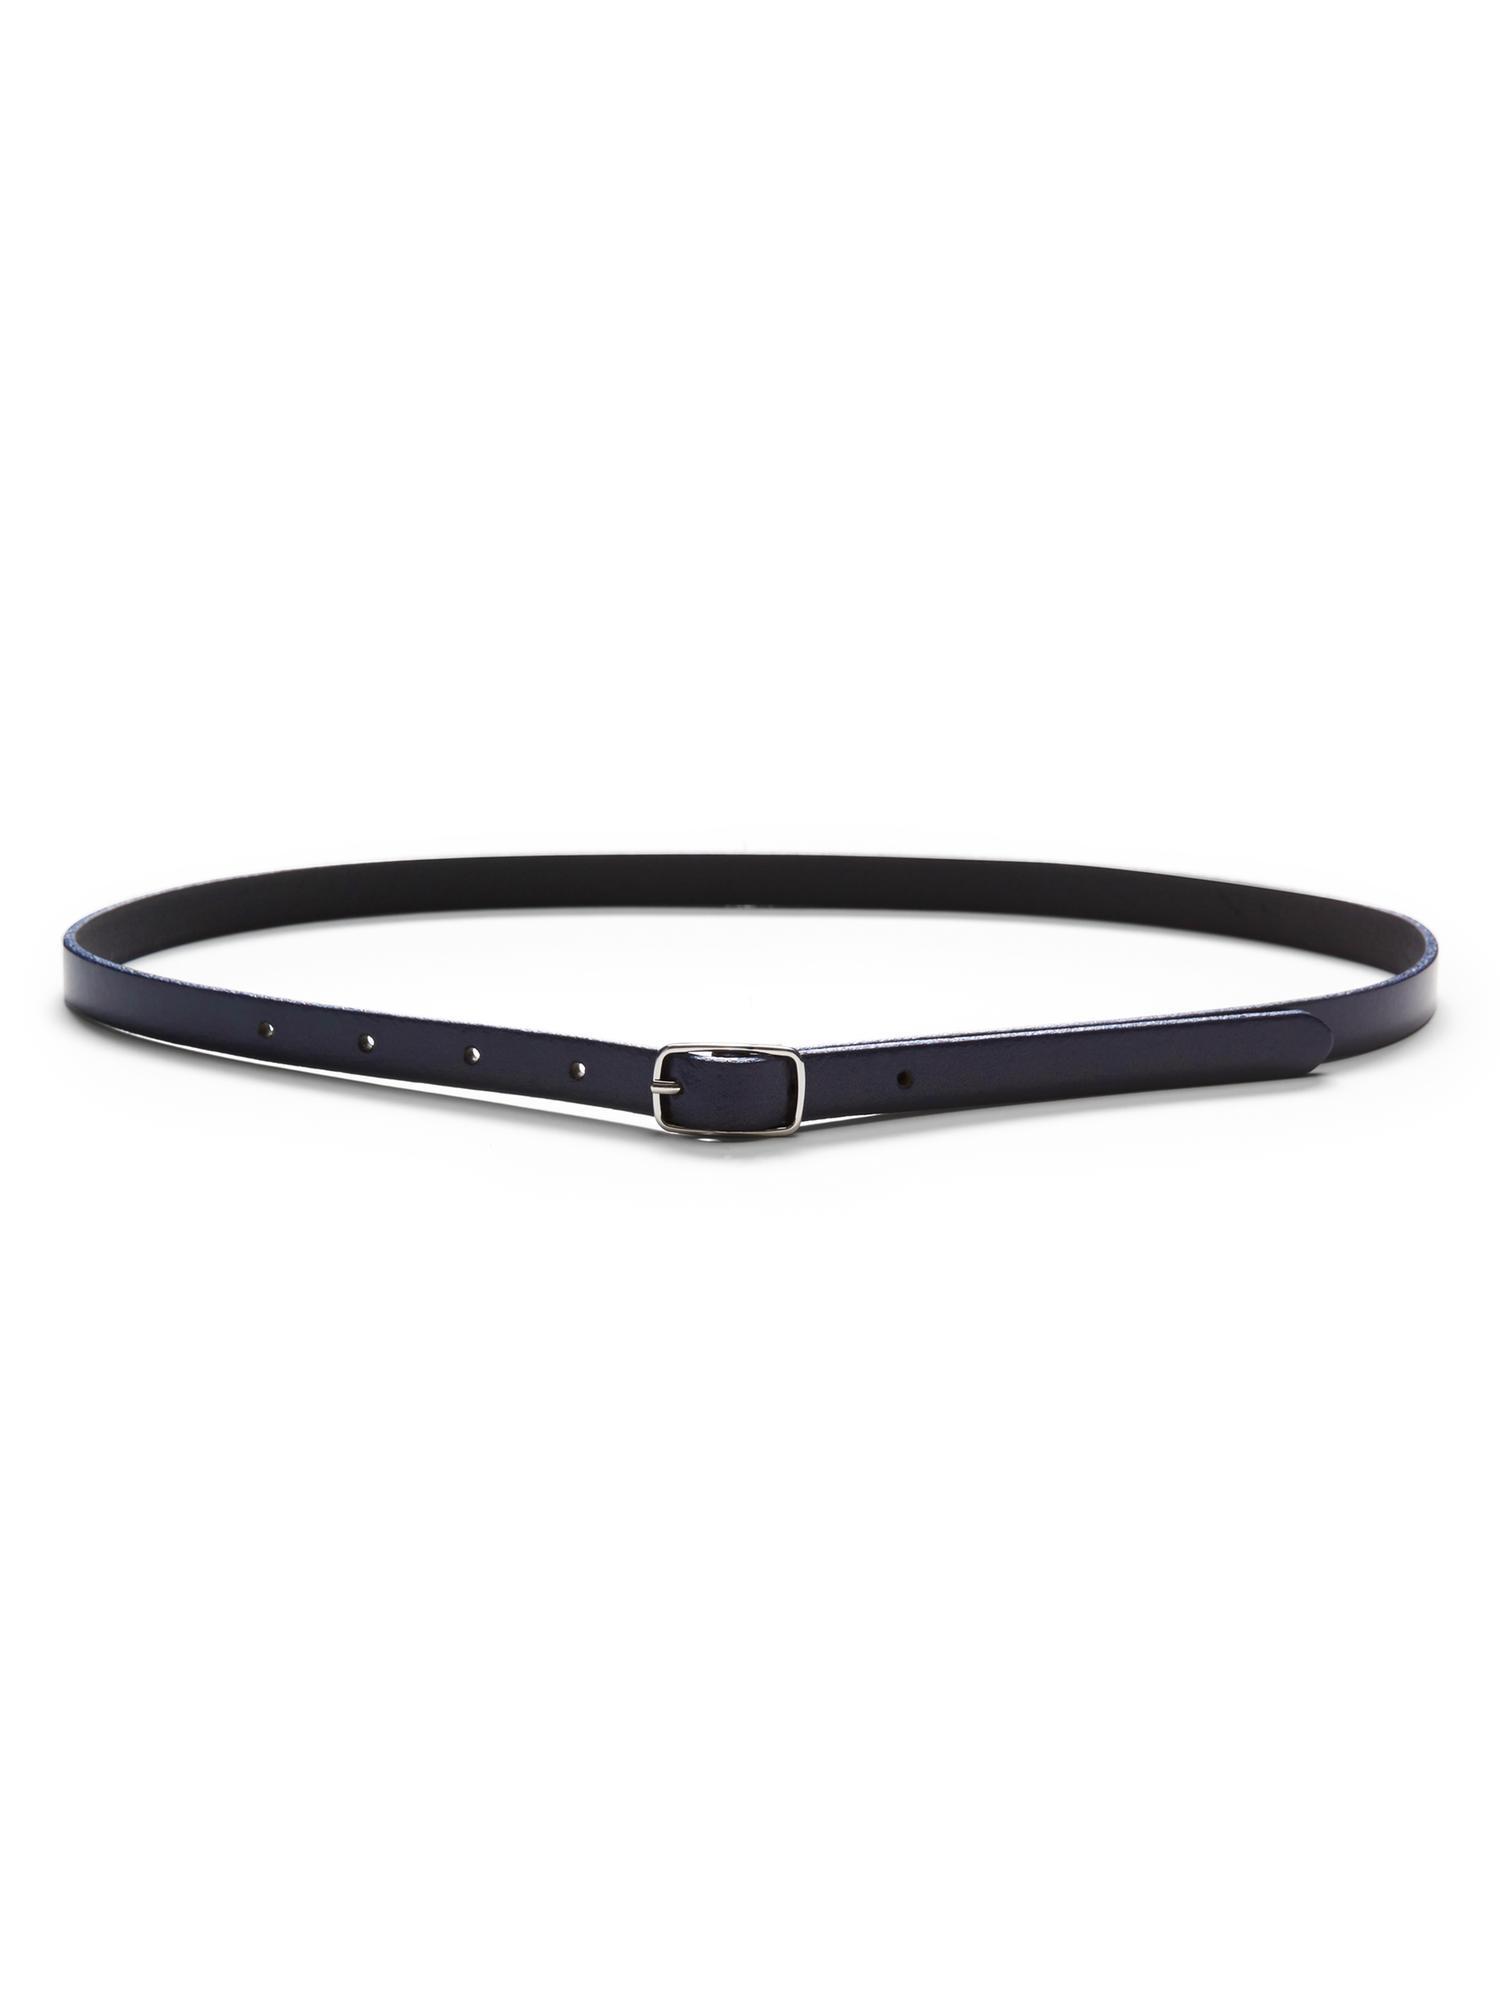 Banana Republic Centerbar Italian Leather Skinny Belt In